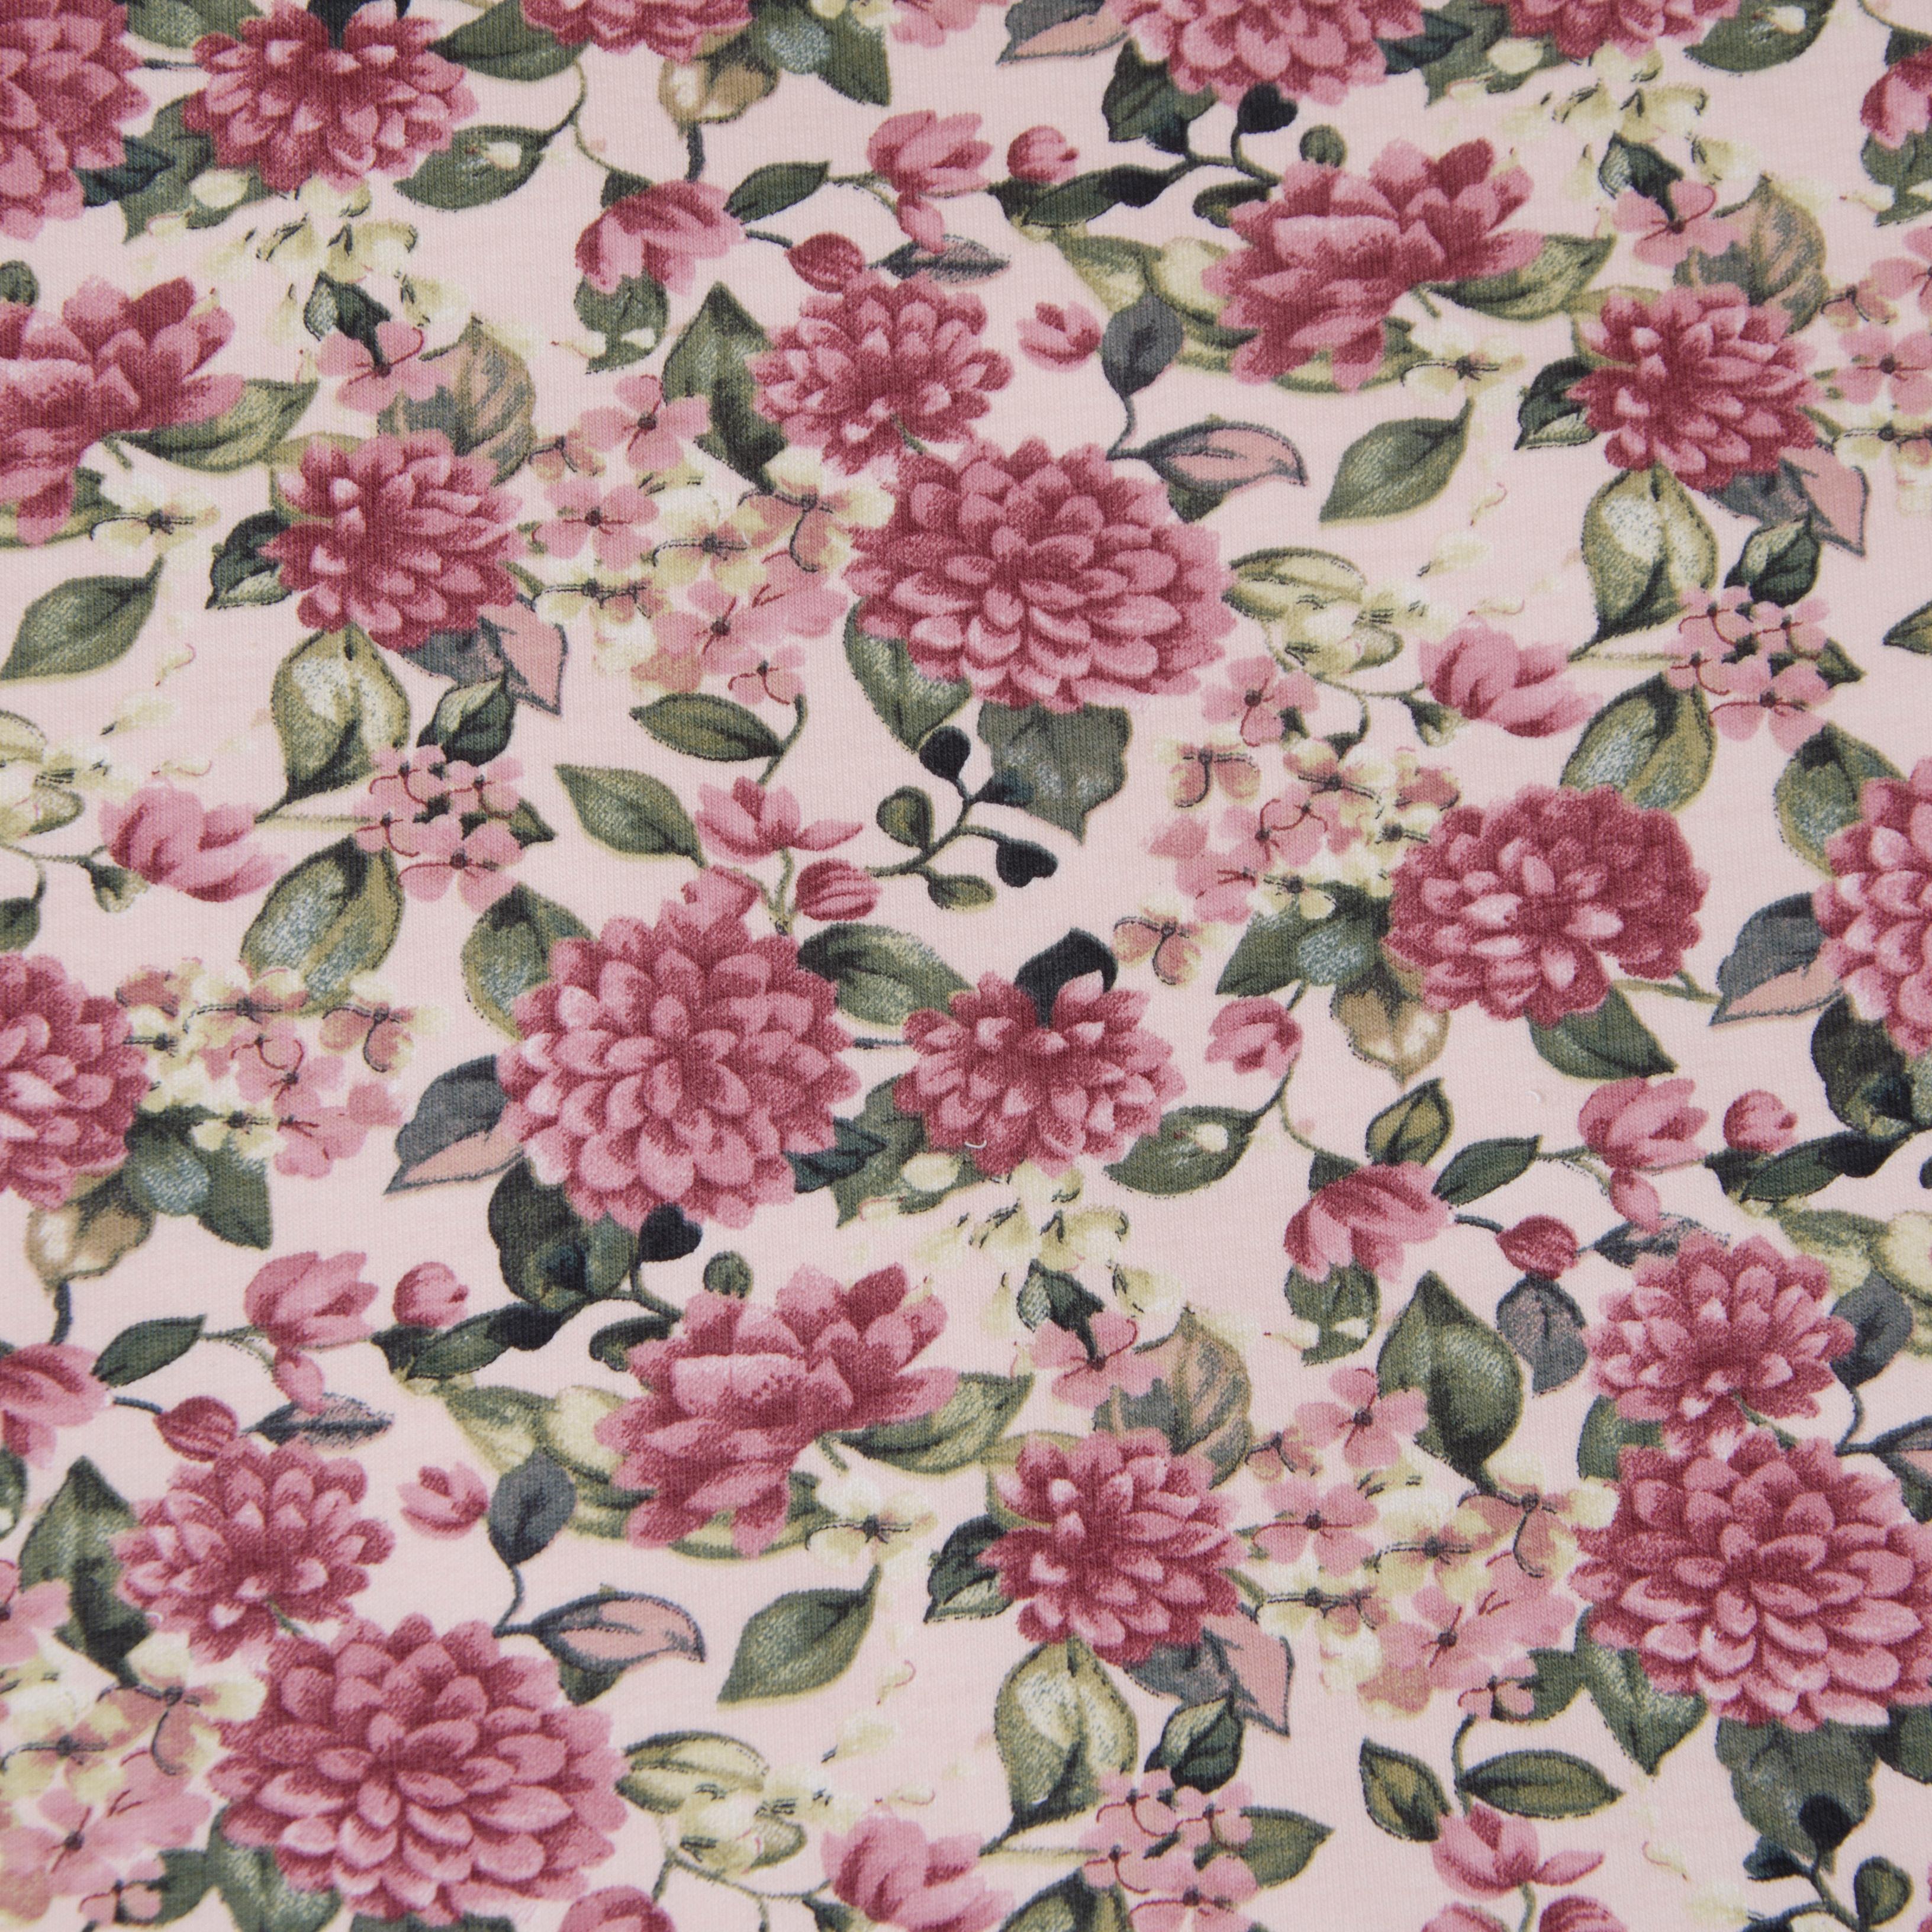 Sweat - Felia rosa von Hilco